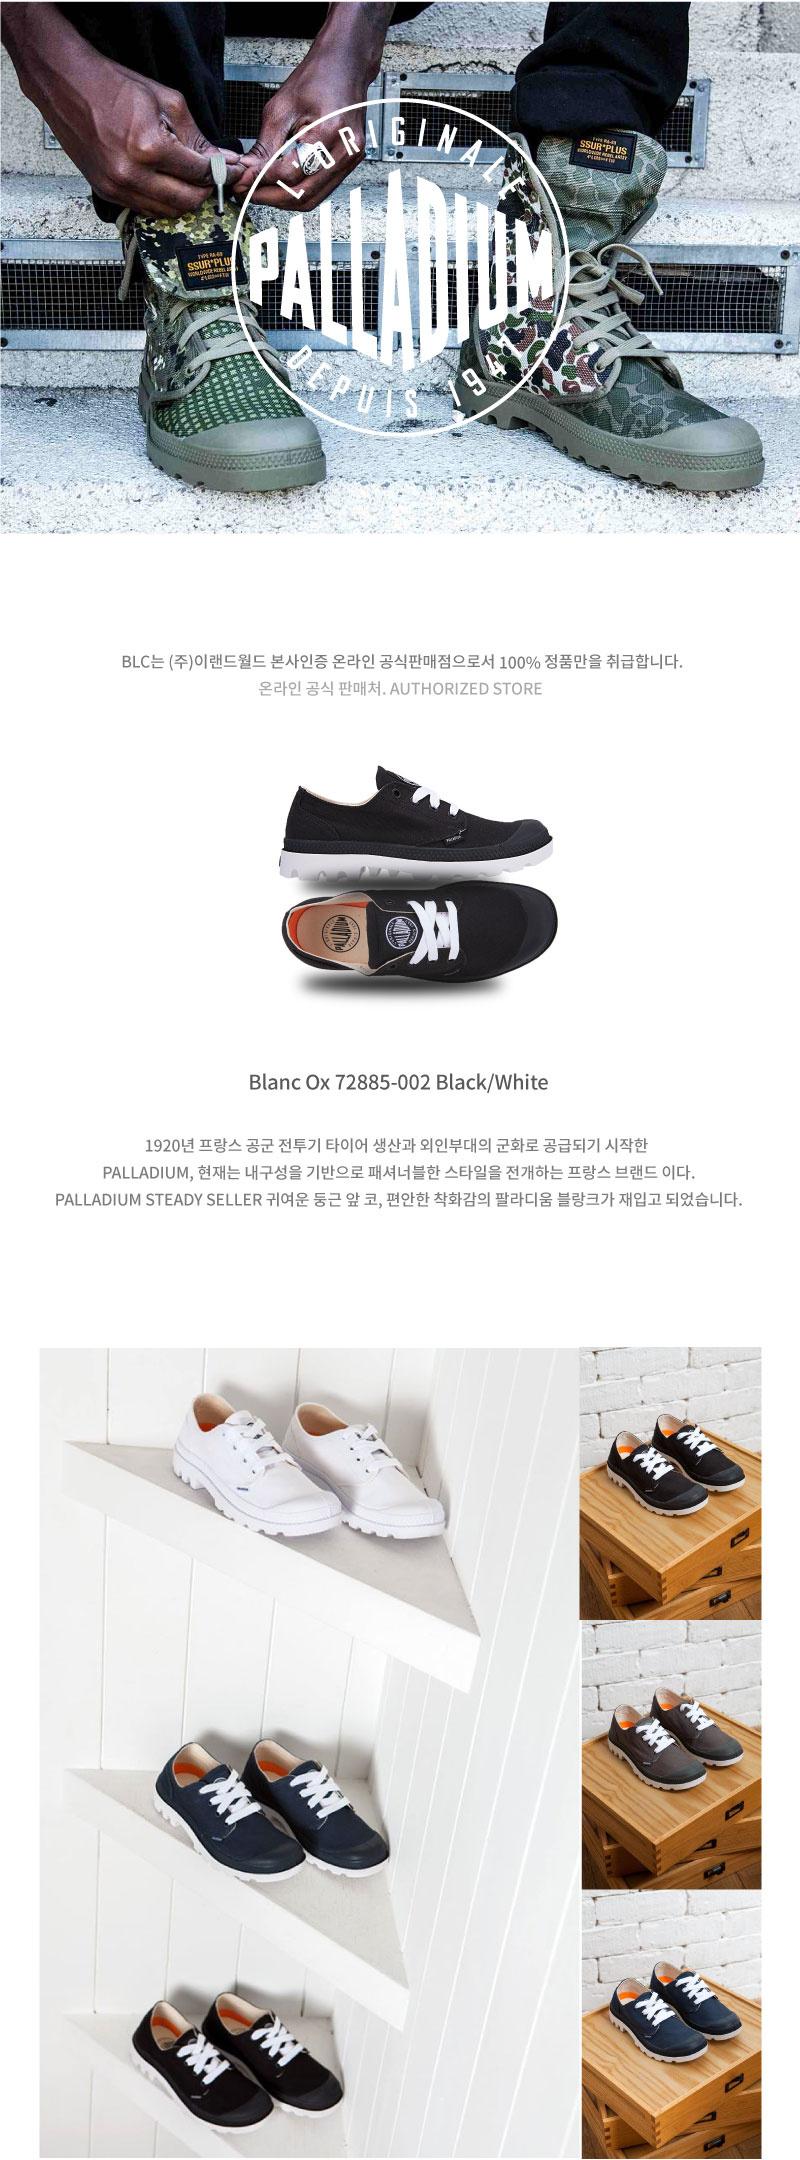 Blanc-Ox-72885-002-Black-White.jpg